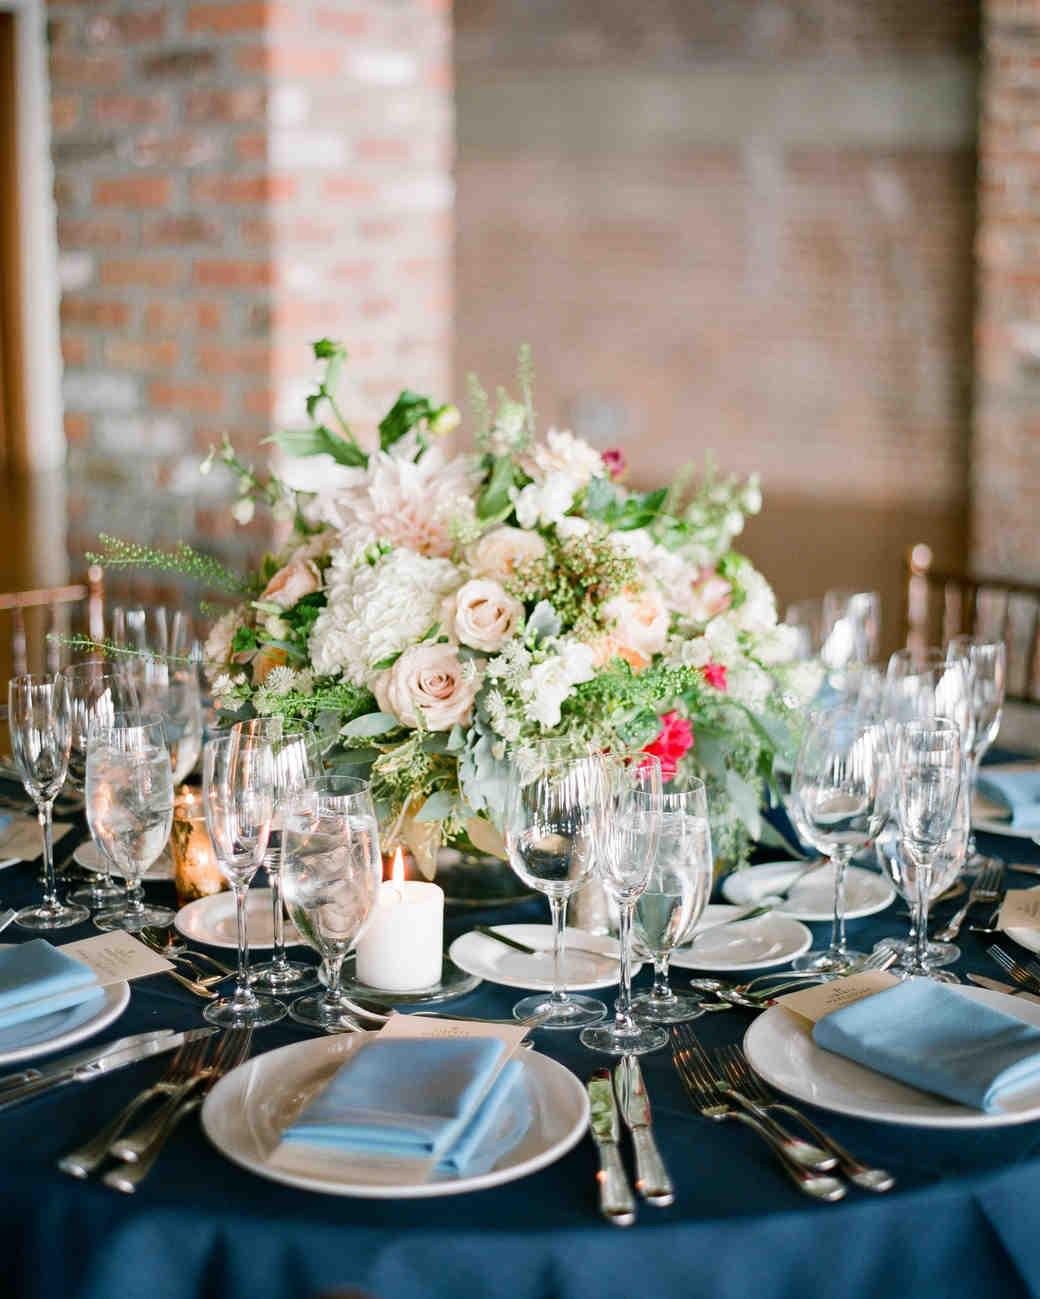 75 Great Wedding Centerpieces | Martha Stewart Weddings